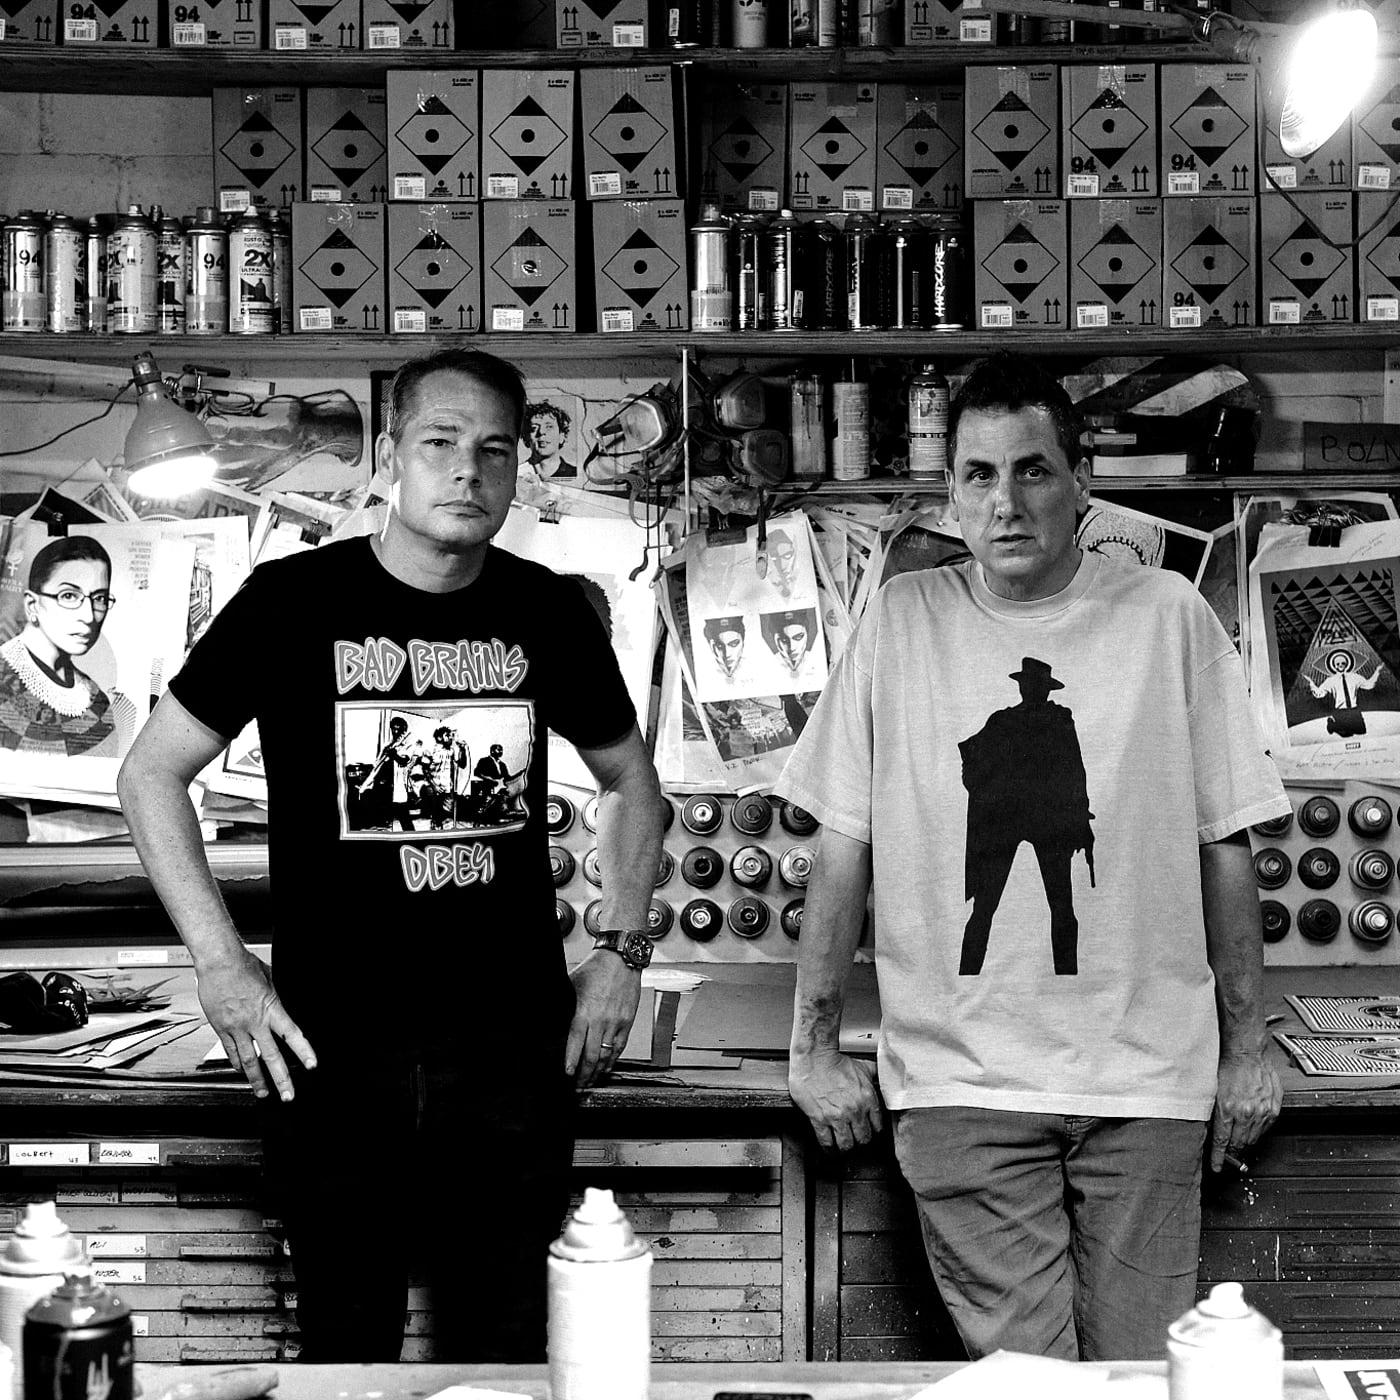 Mike Dean and Shepard Fairey